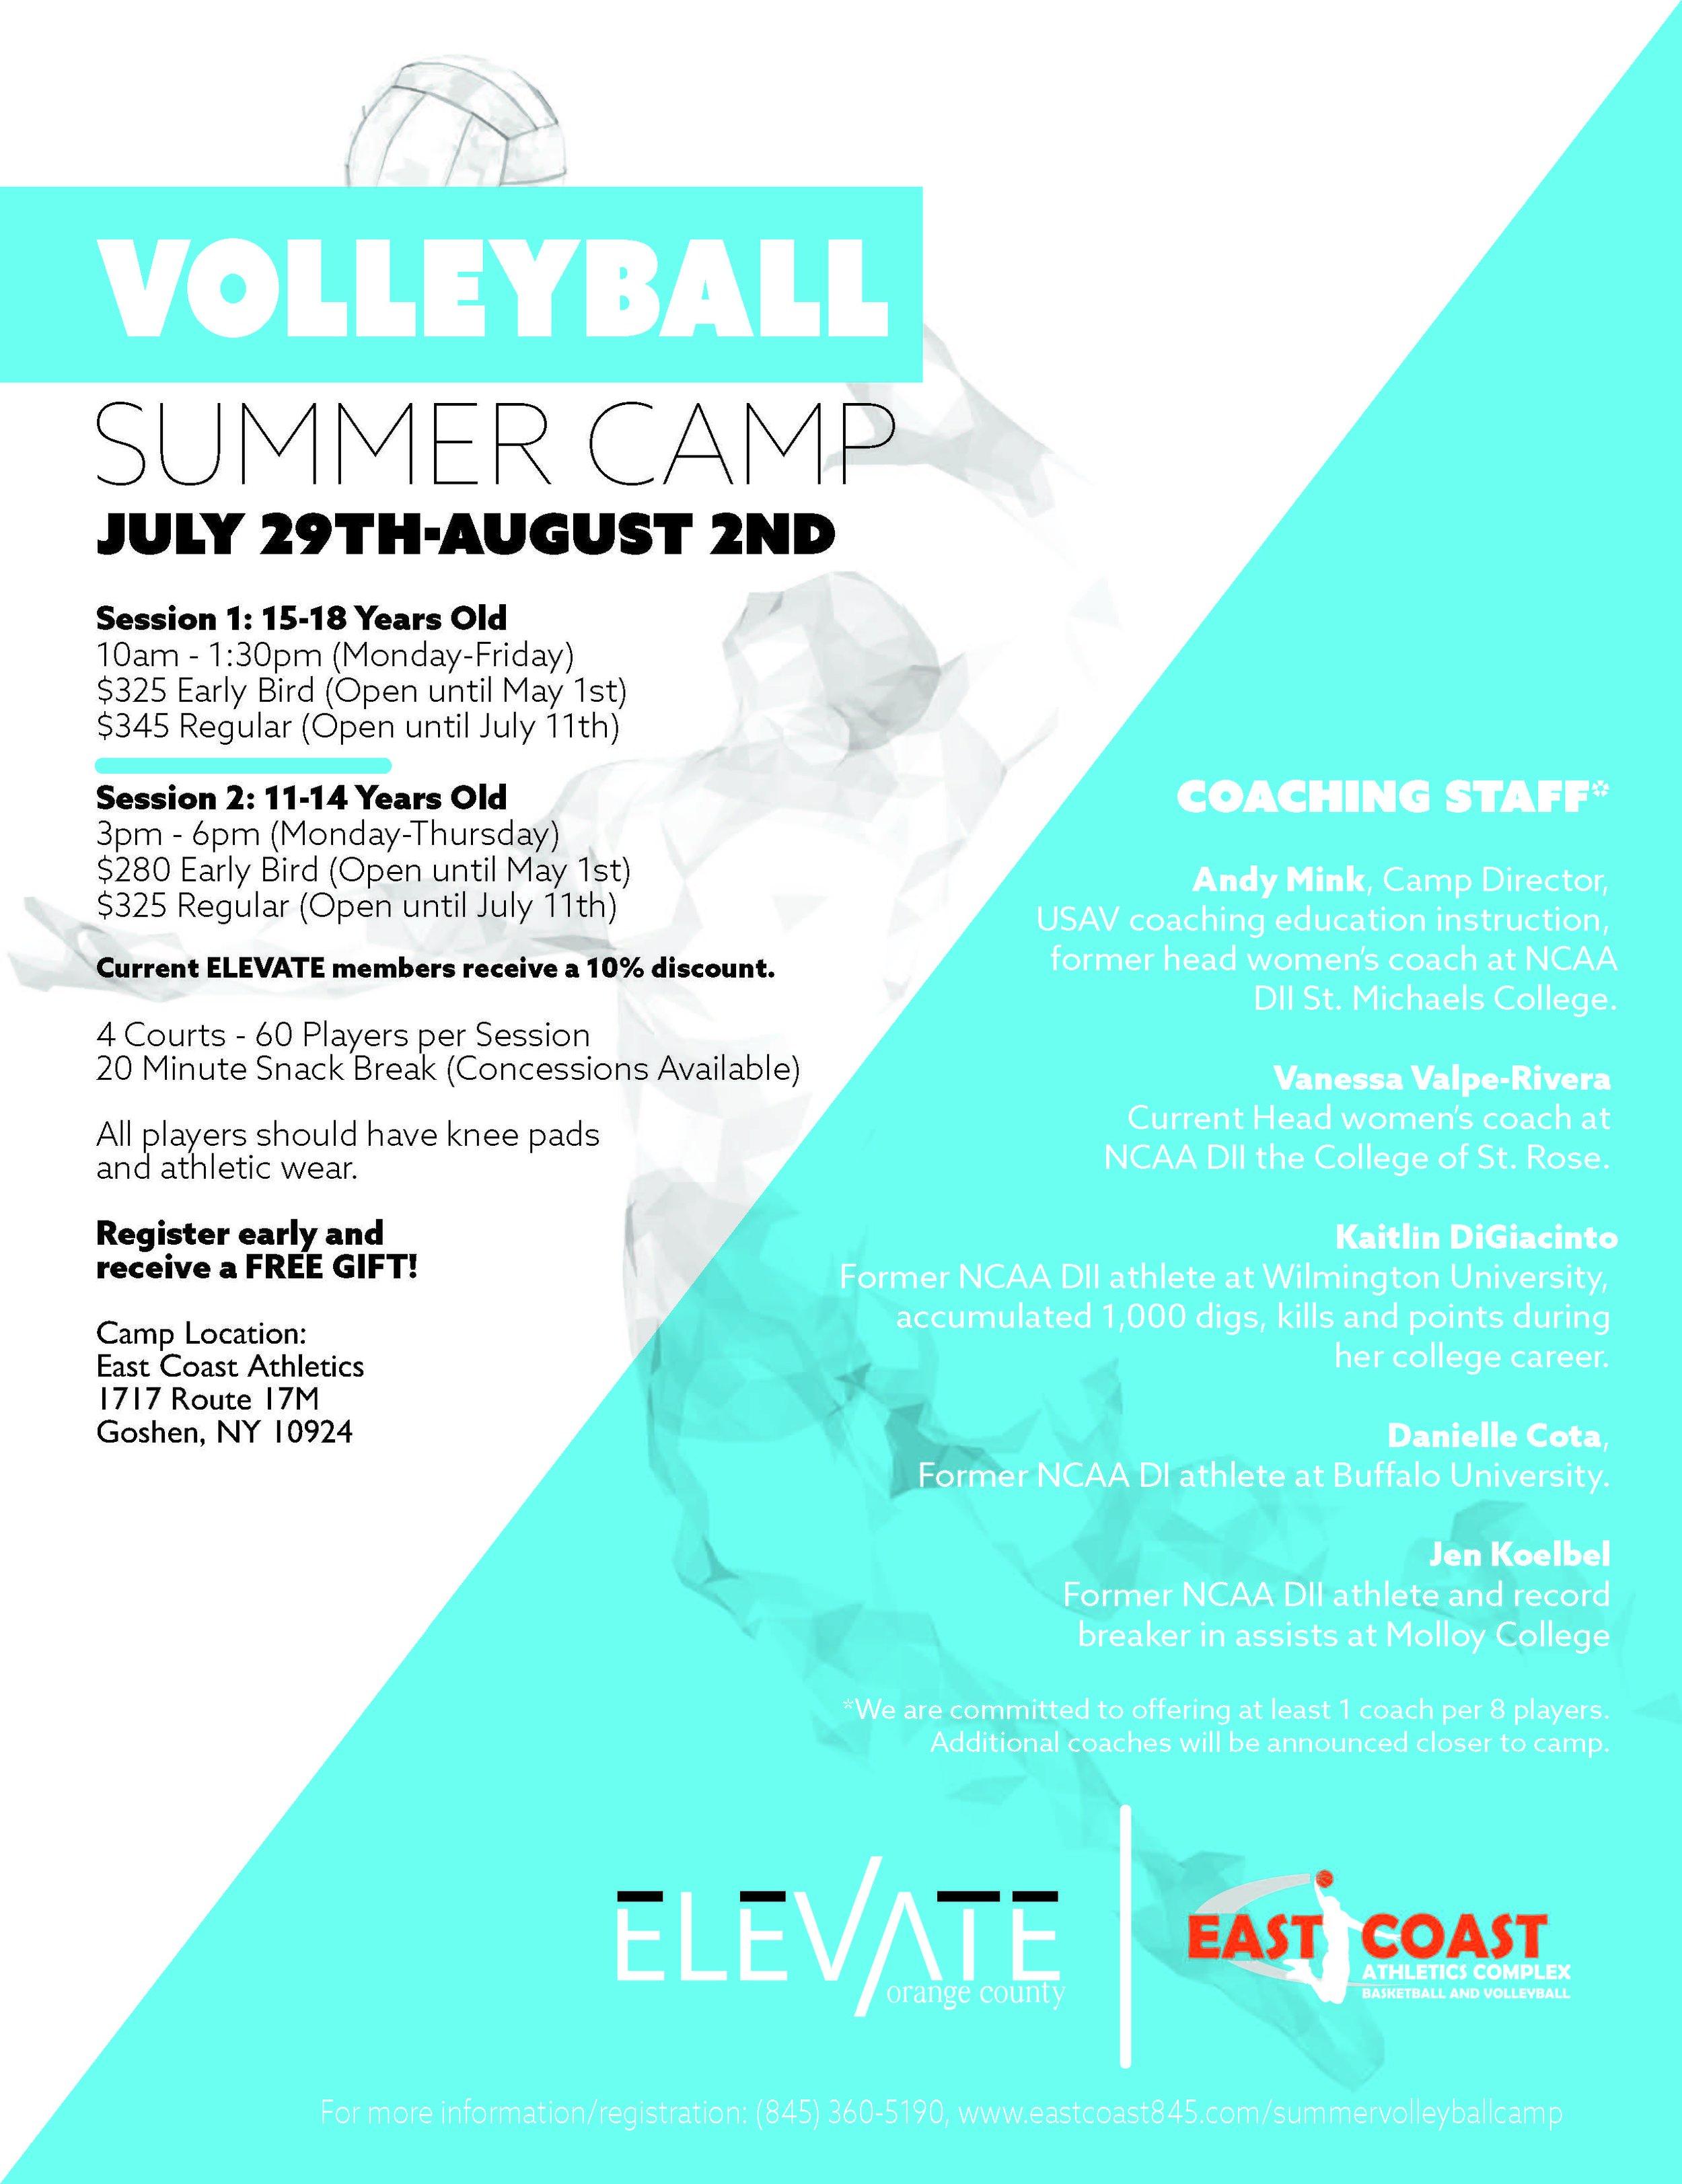 SummerCamp 2019_volleyball.jpg